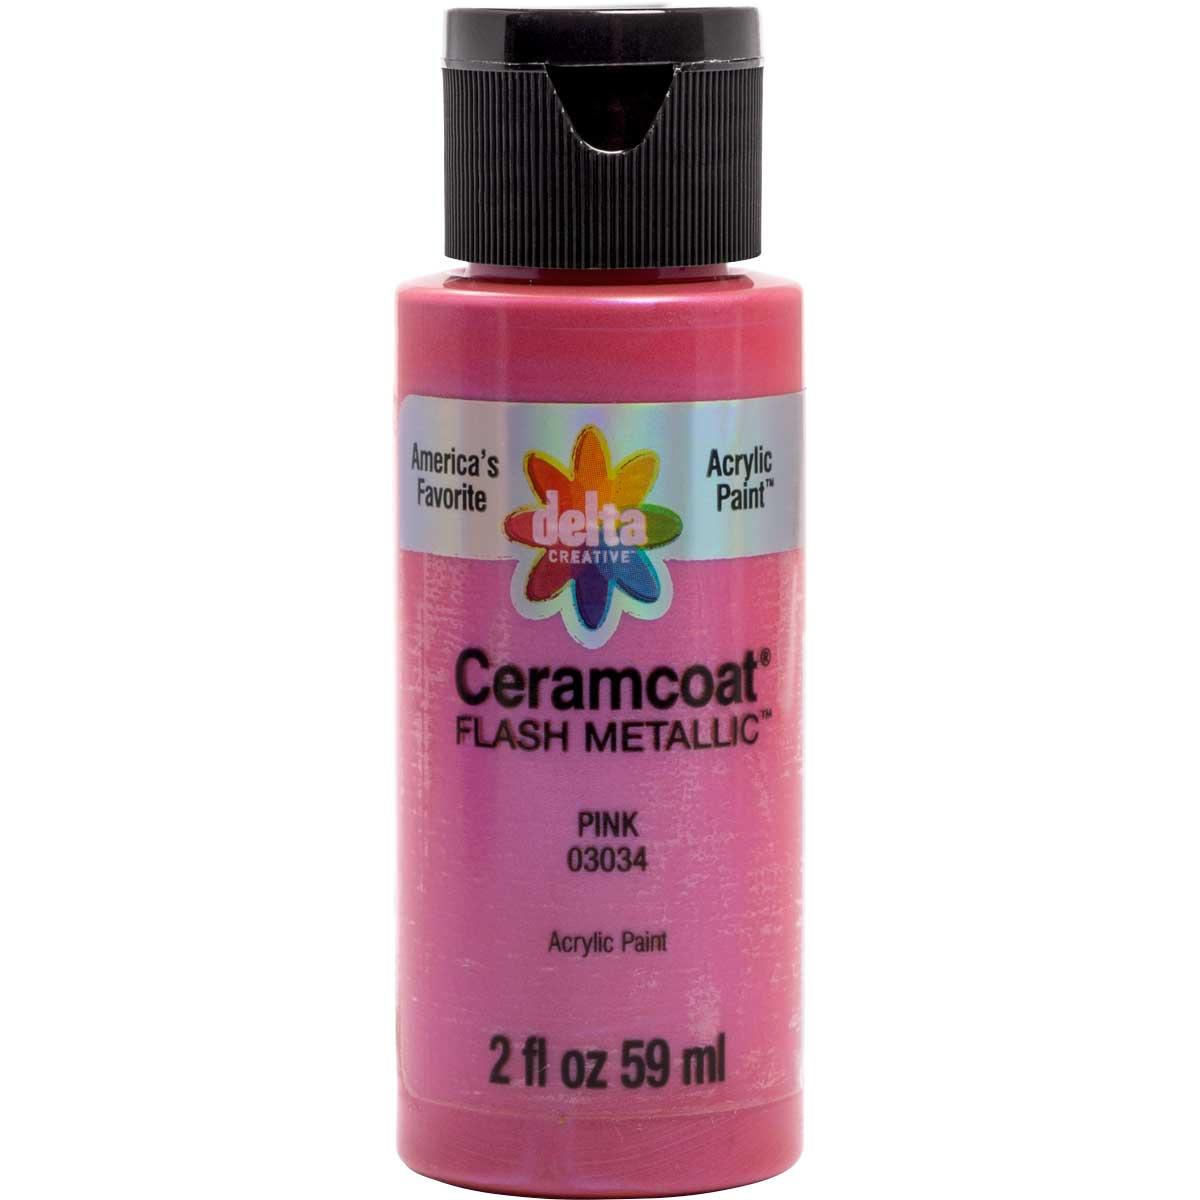 Delta Ceramcoat ® Acrylic Paint - Flash Metallic Pink, 2 oz.